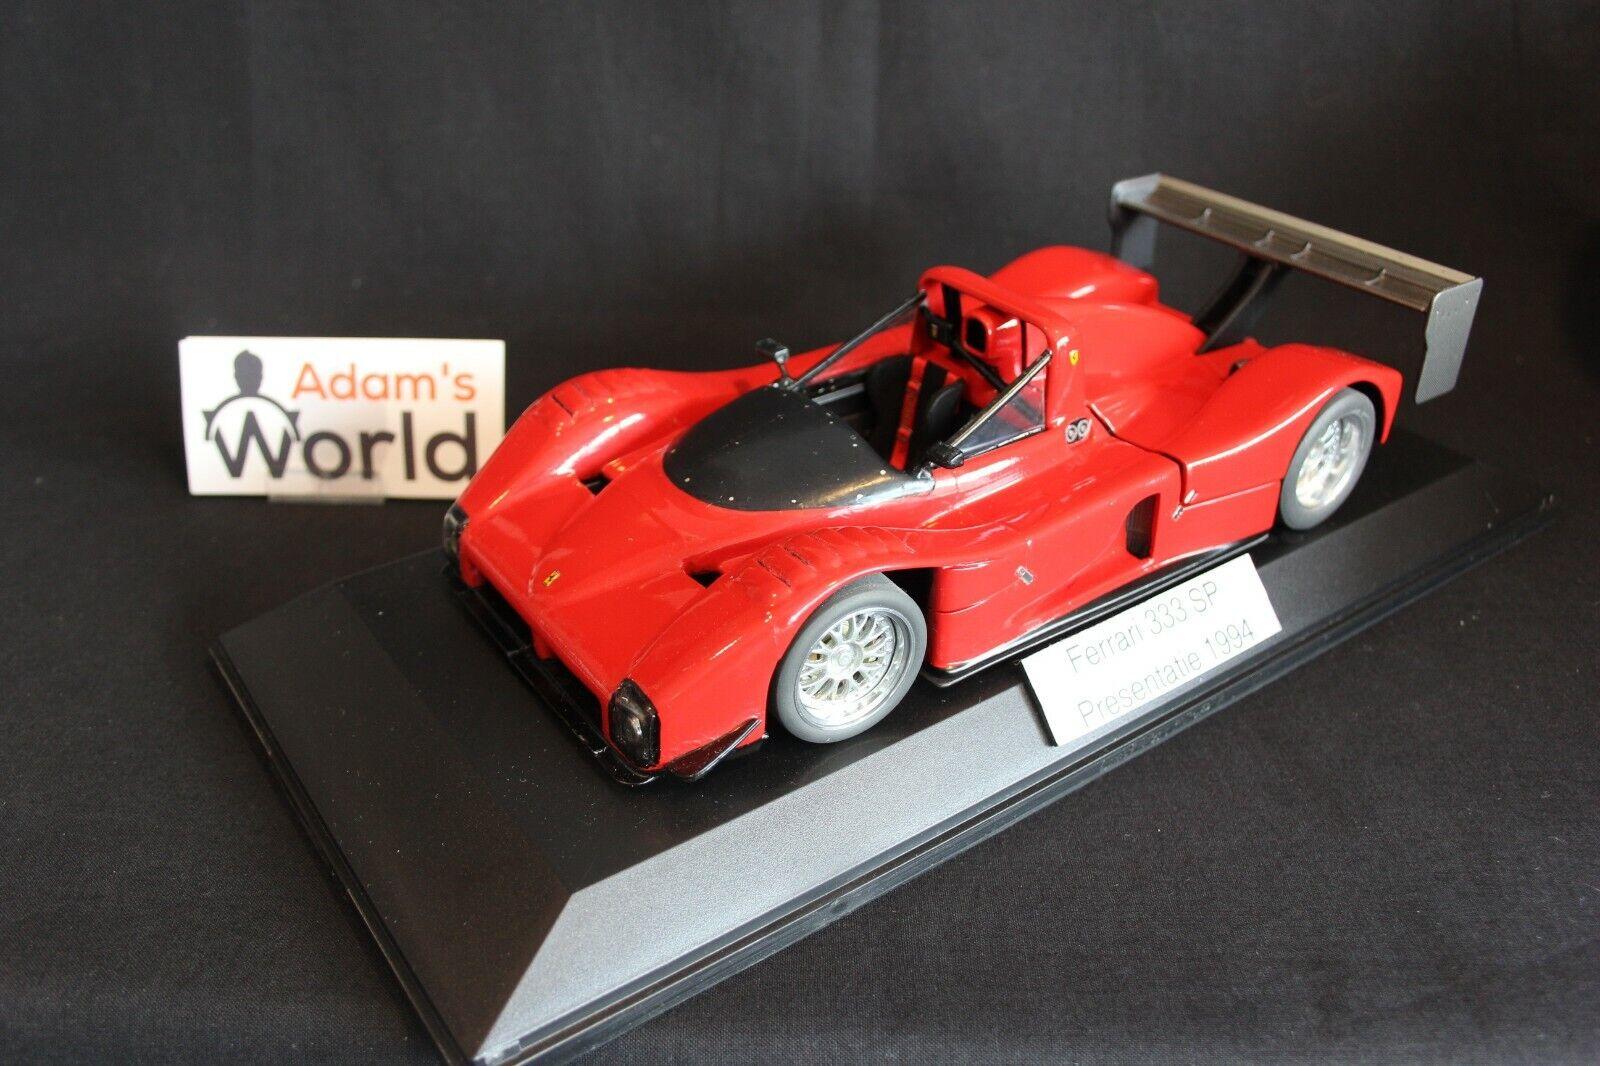 Hot Wheels transkit Ferrari 333 SP 1994 1 18 presentation 1994 version (PJBB)